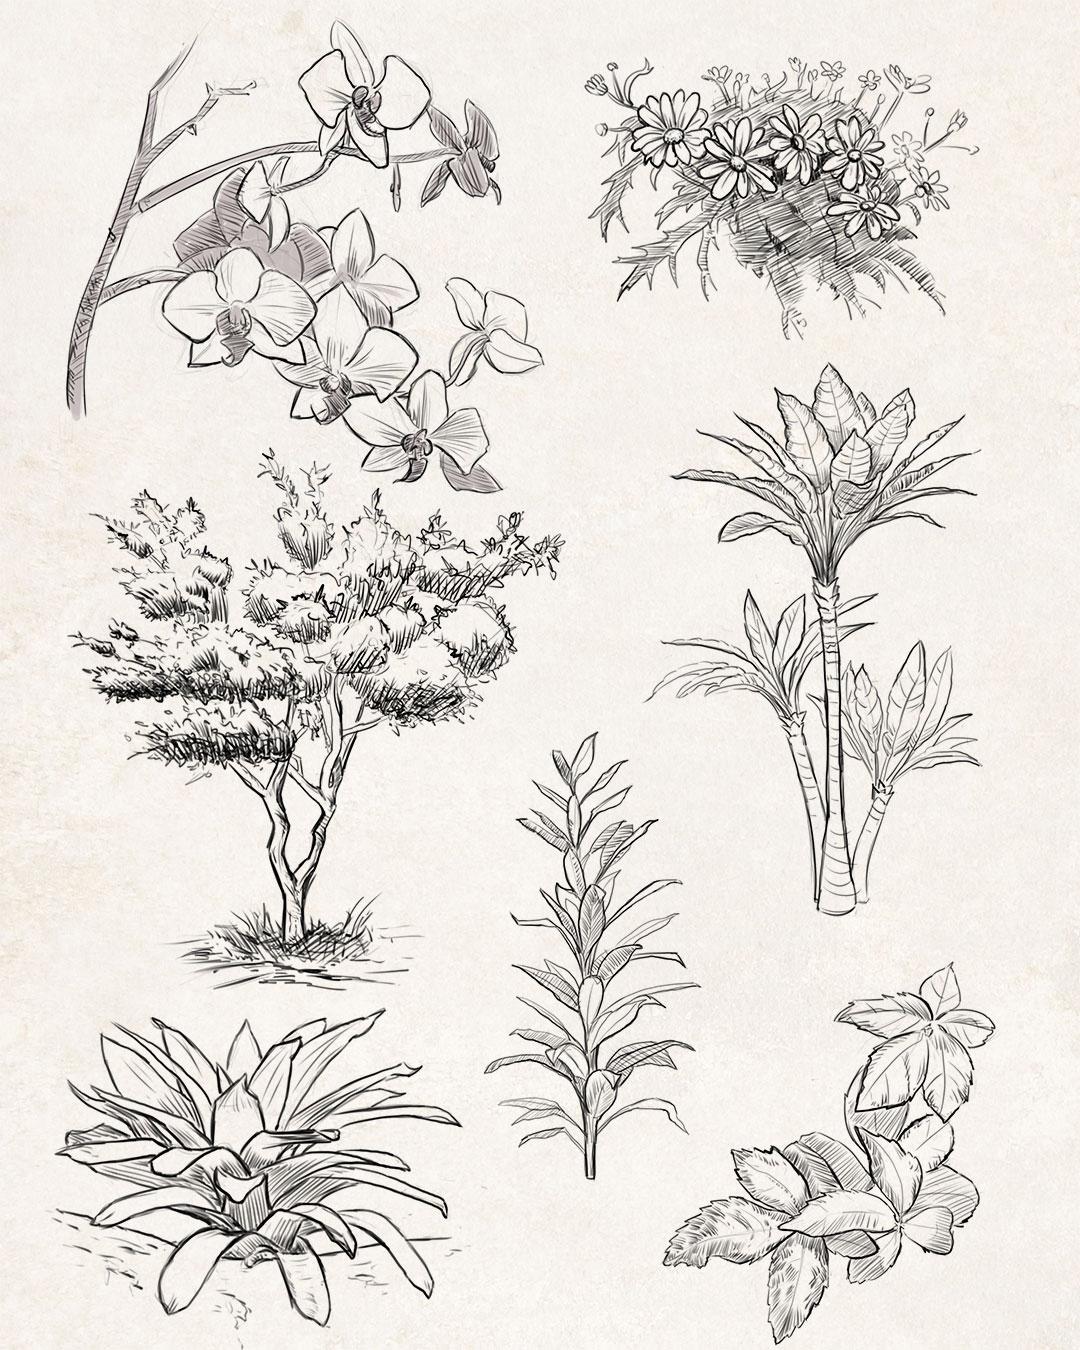 Sketches: Plants 3 plants - inktober - manfredrohrer   ello